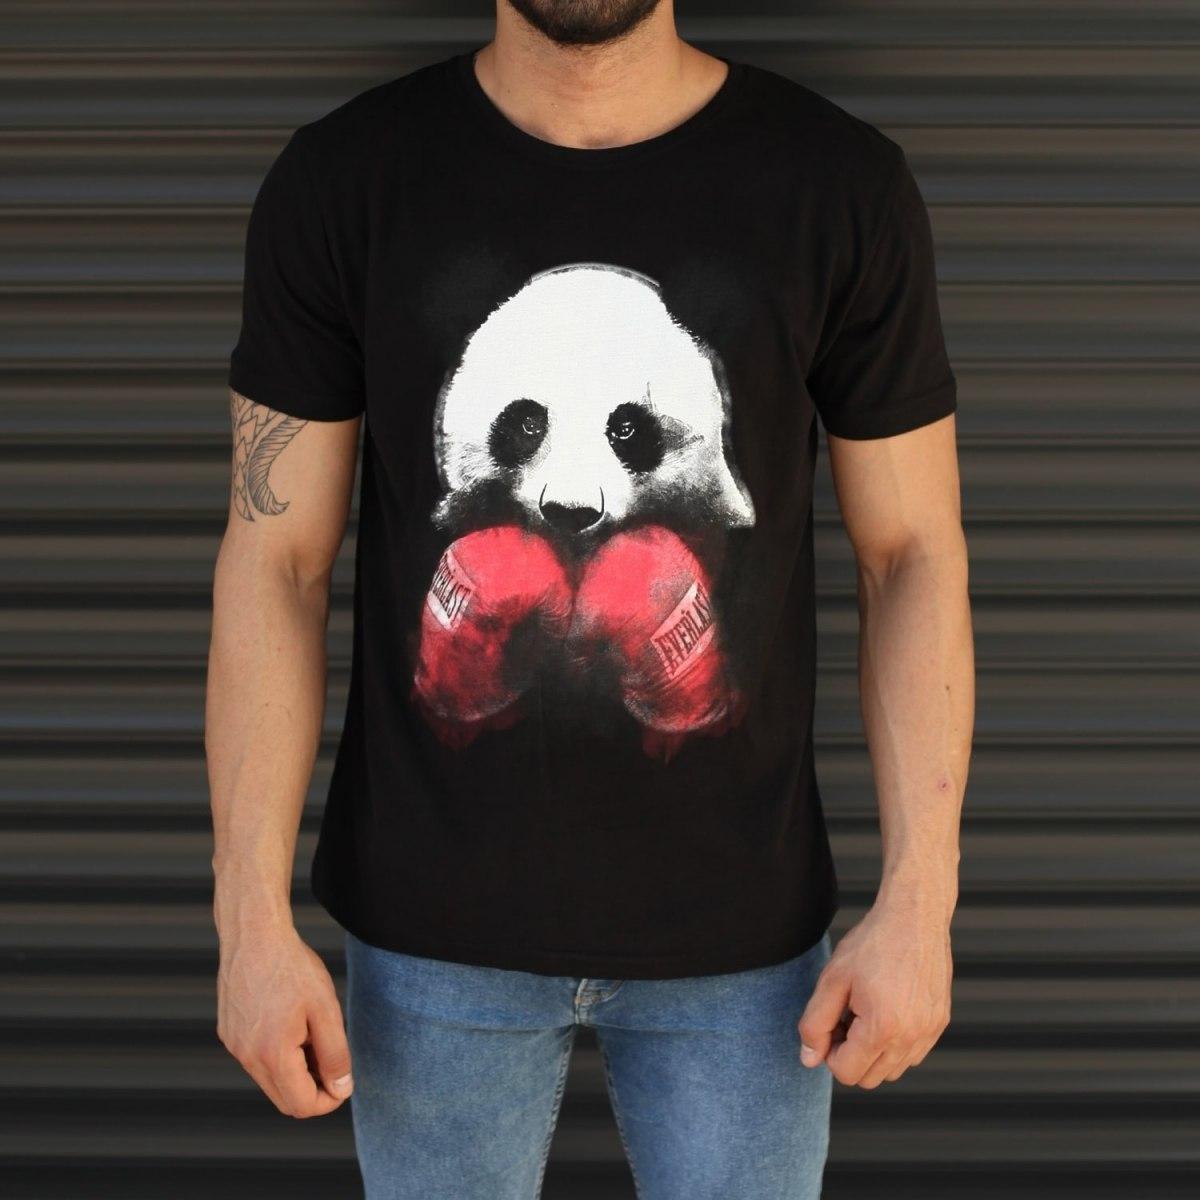 Men's Sporty Panda Printed Fit T-Shirt In Black Mv Premium Brand - 1